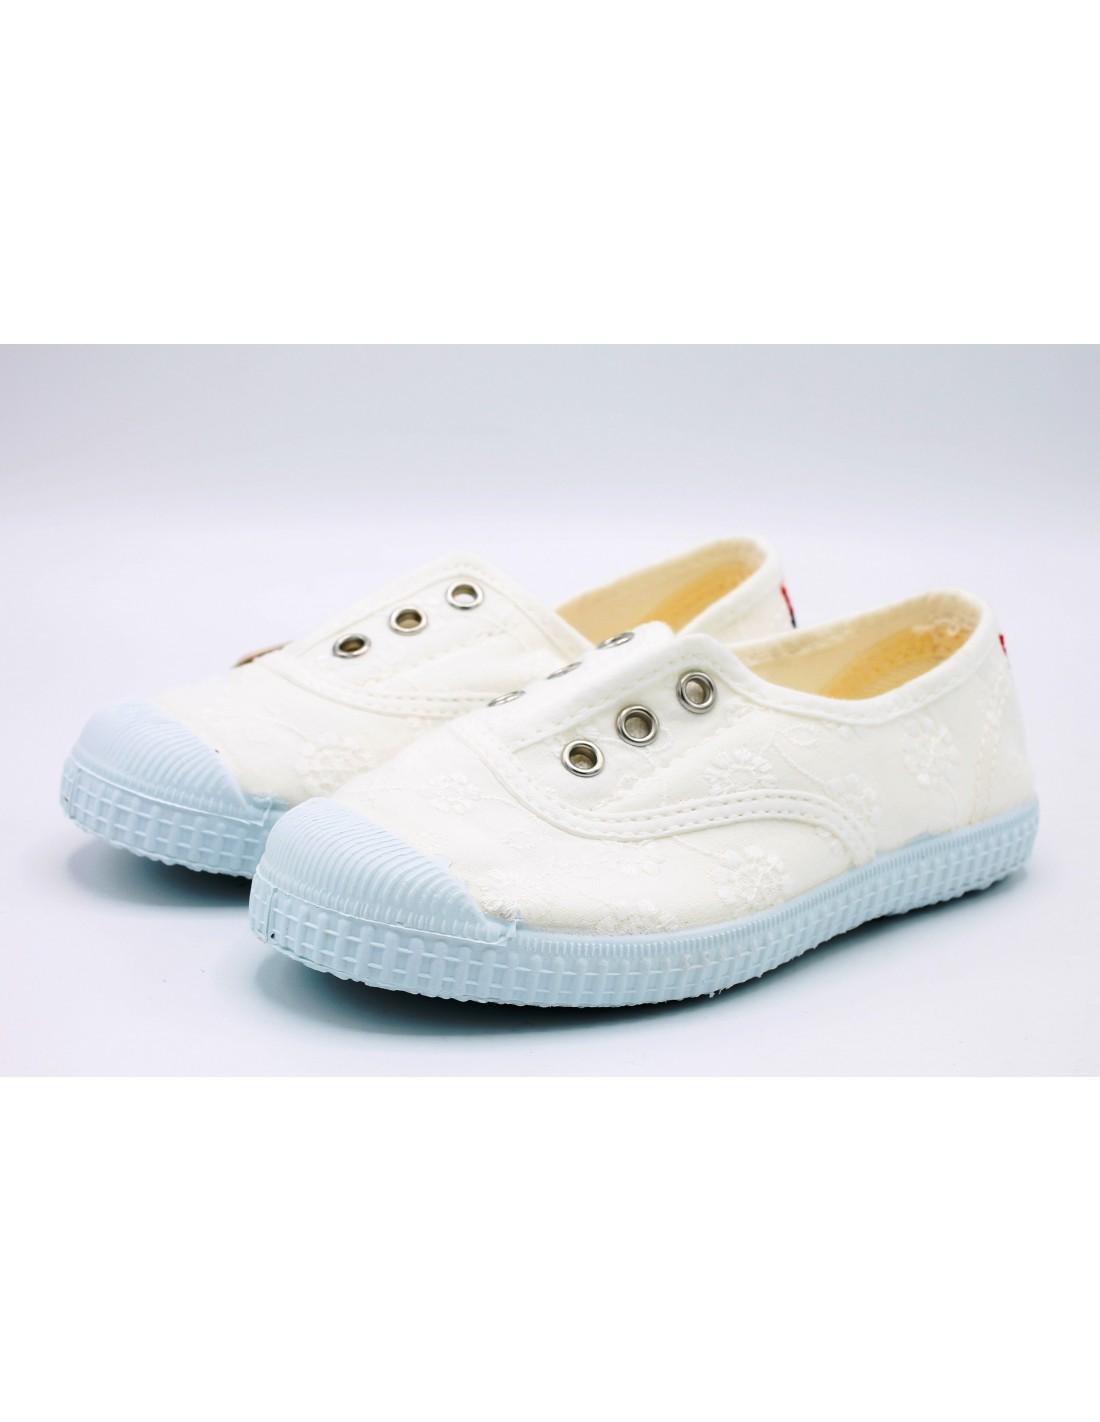 Cienta Scarpe da Bambini Sneakers in Tela Tennis Bambino per Bimbi Profumate 27